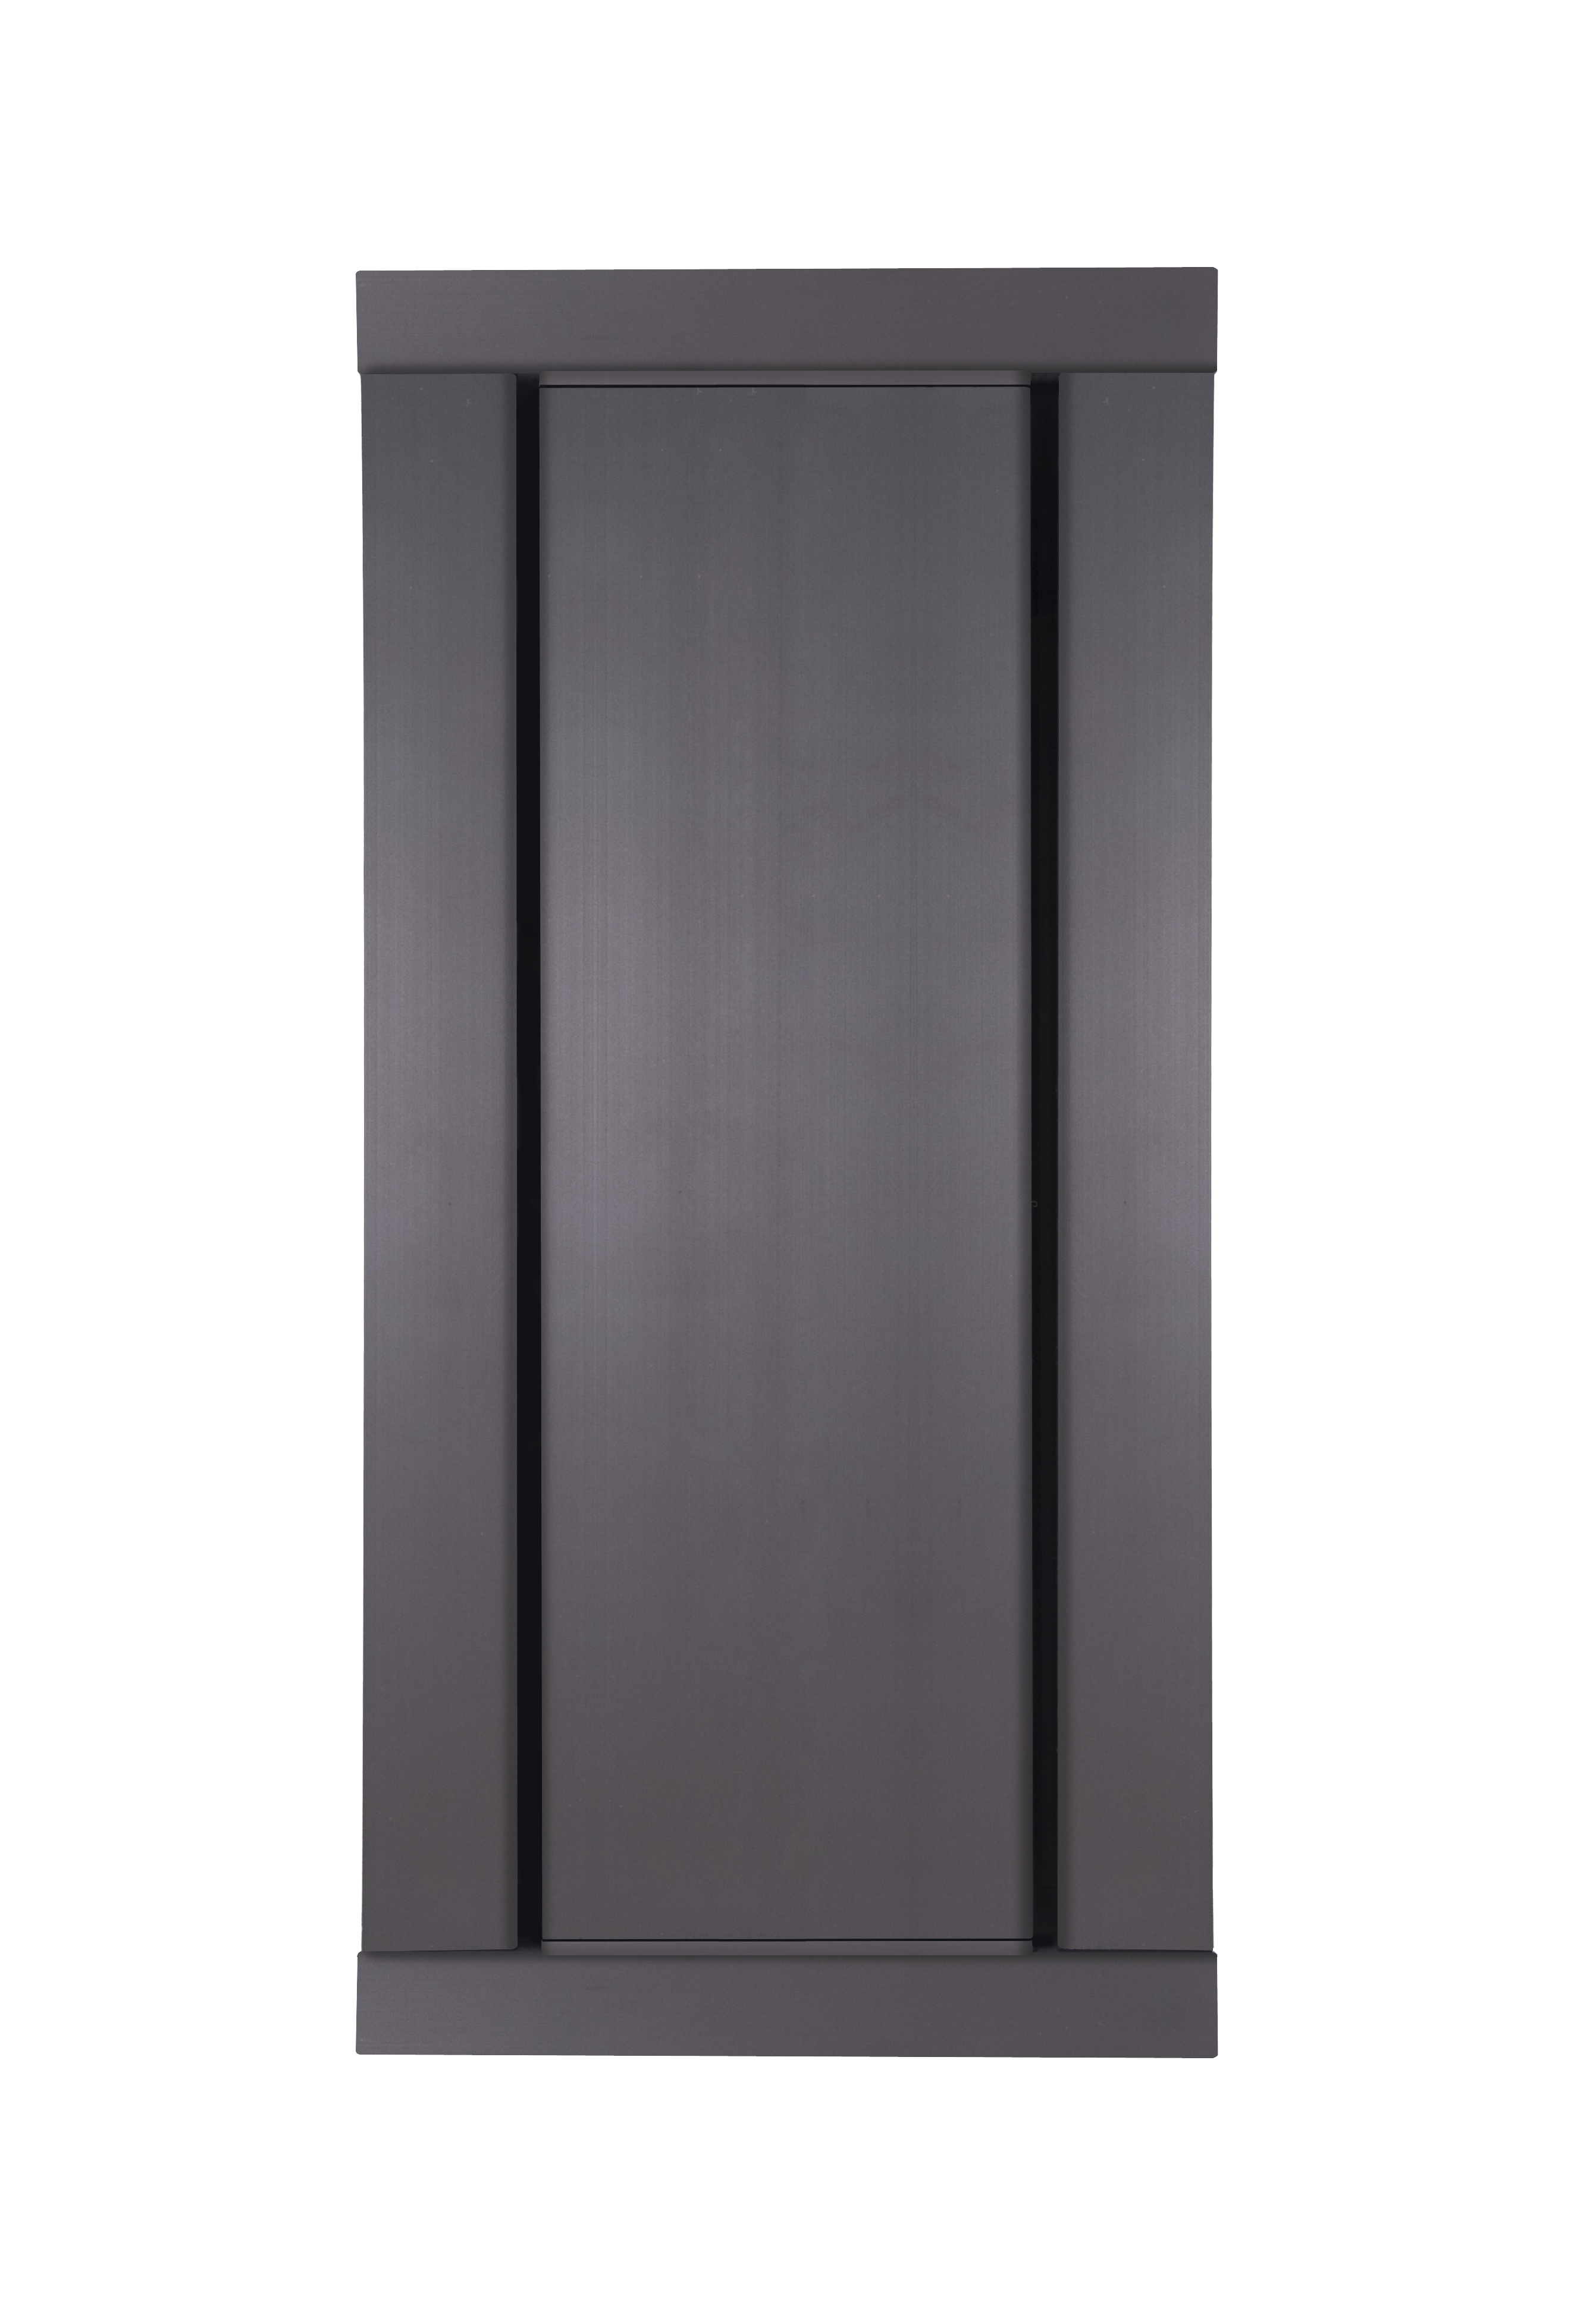 HPX-900 - StraightOn Closed